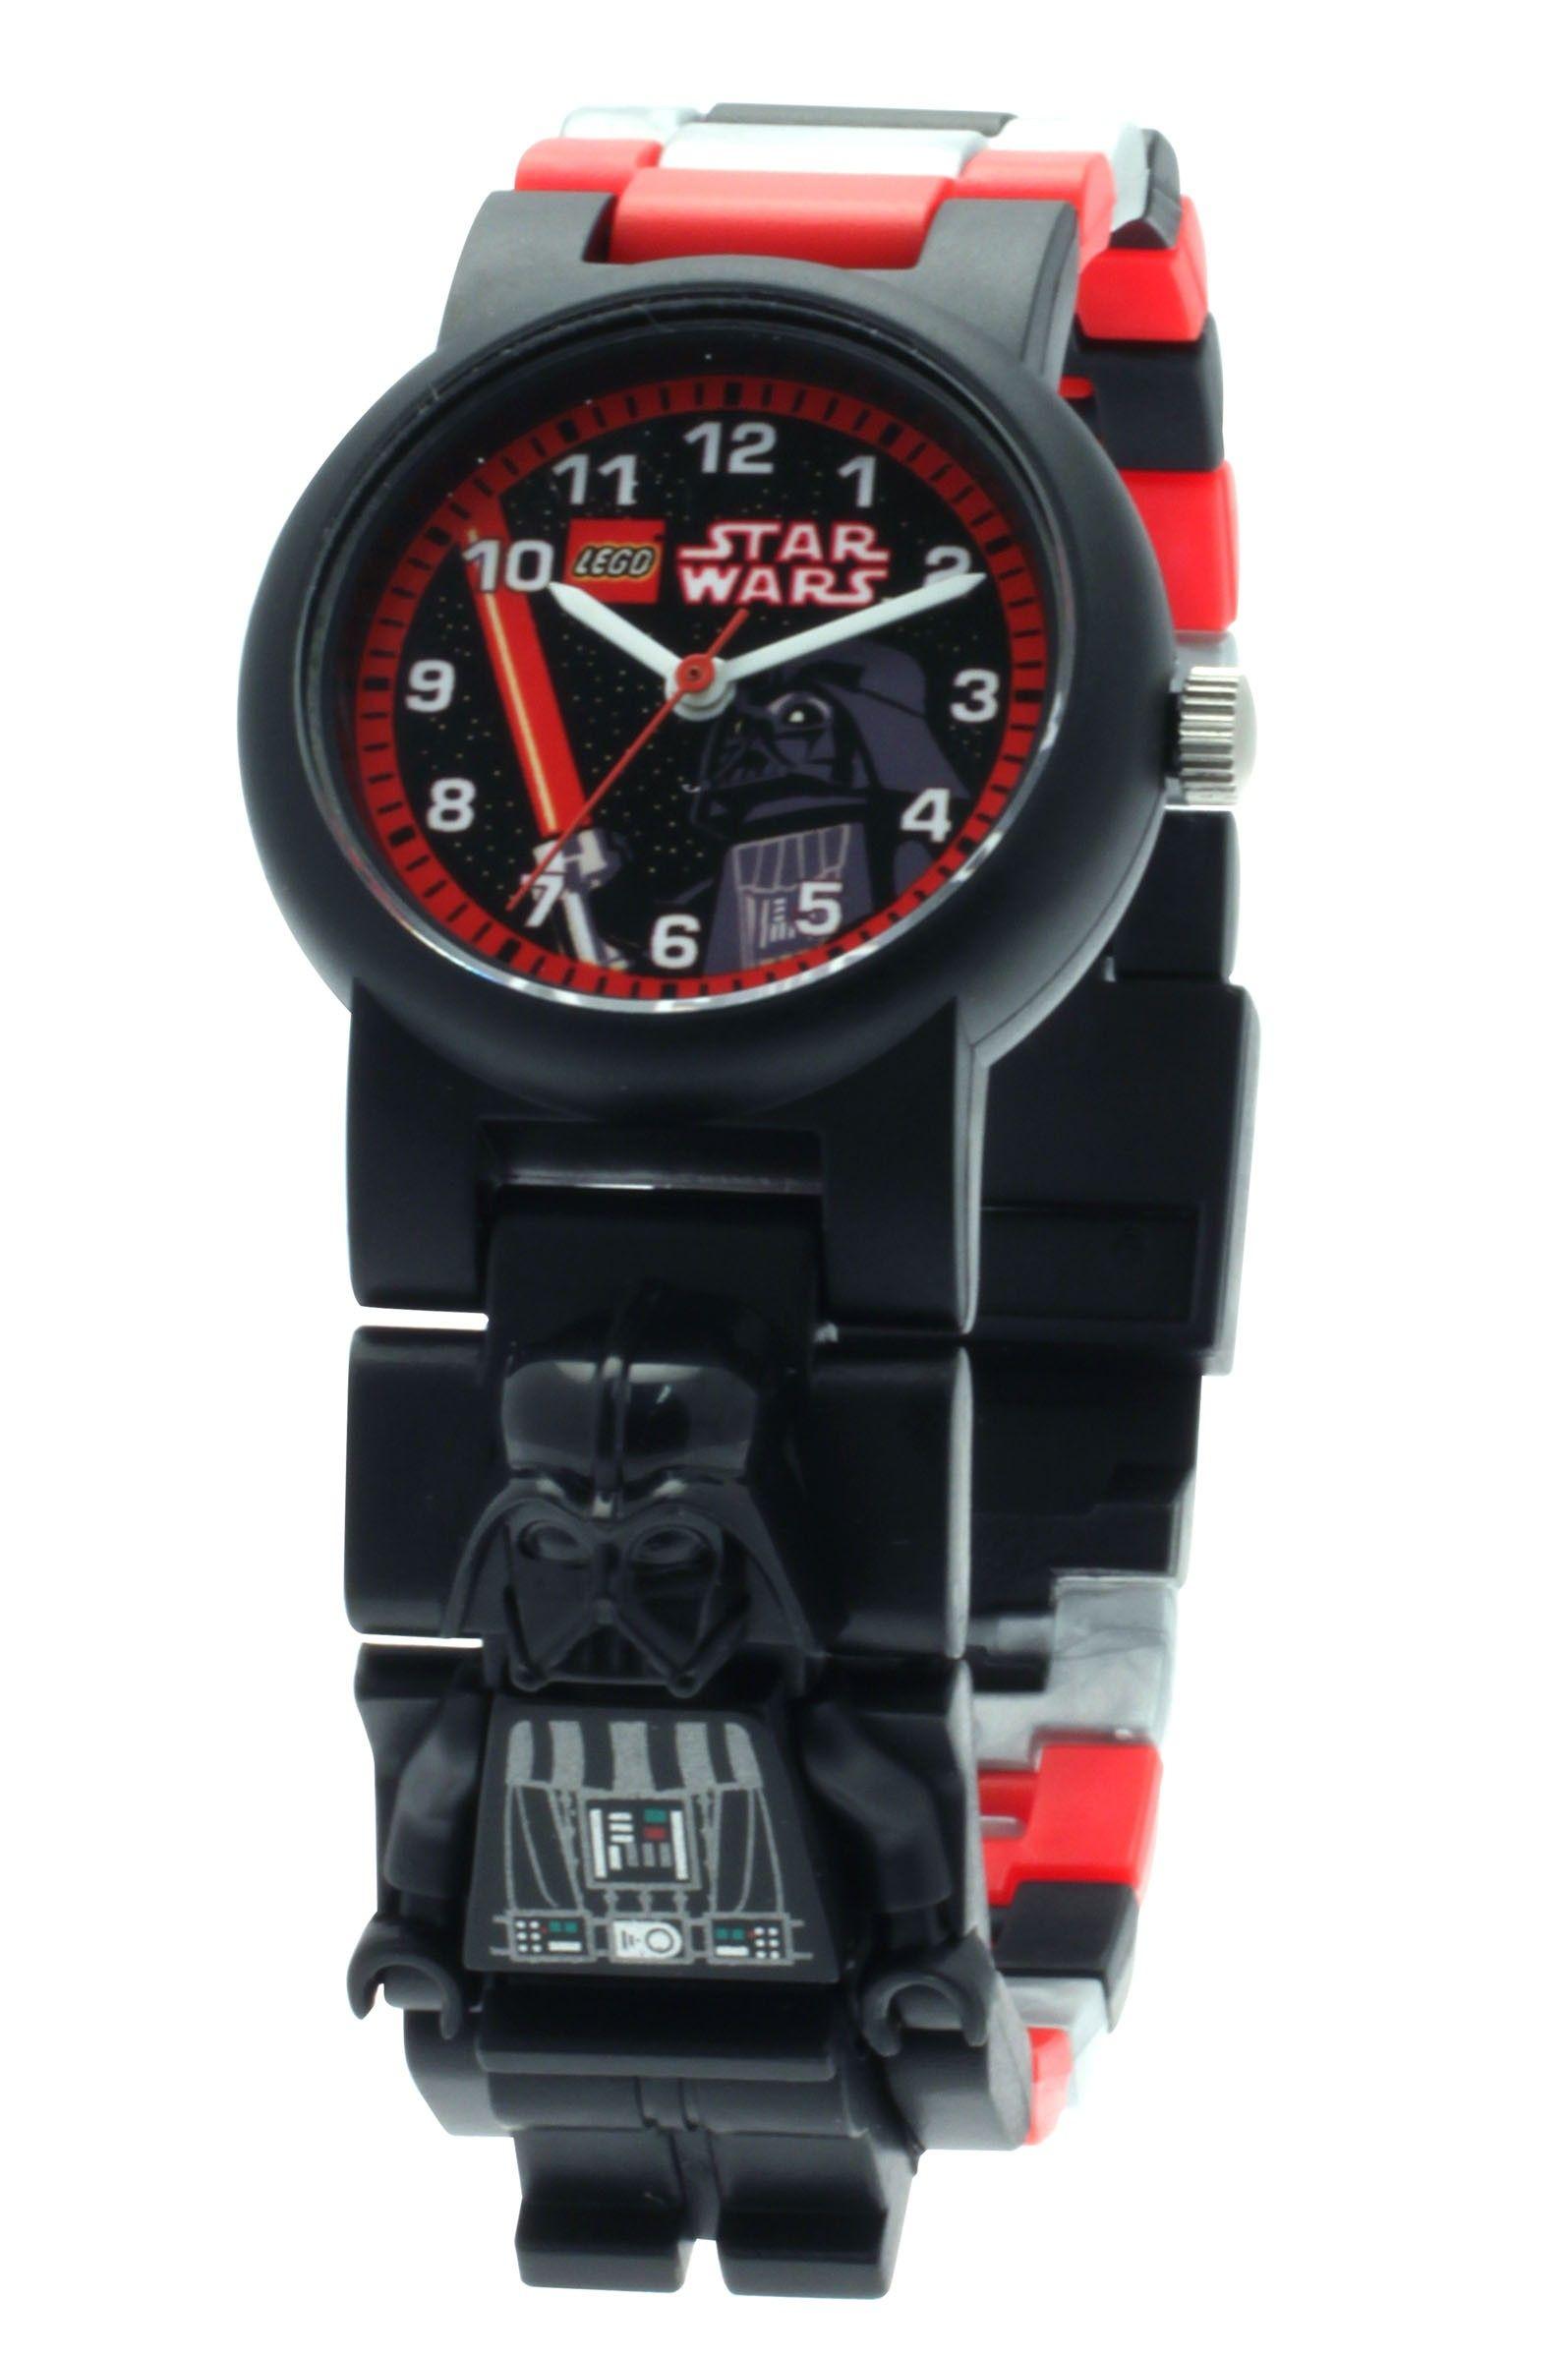 Lego Star Wars Darth Vader Minifigure Link Watch Star Wars Watch Darth Vader Kid Darth Vader Watch